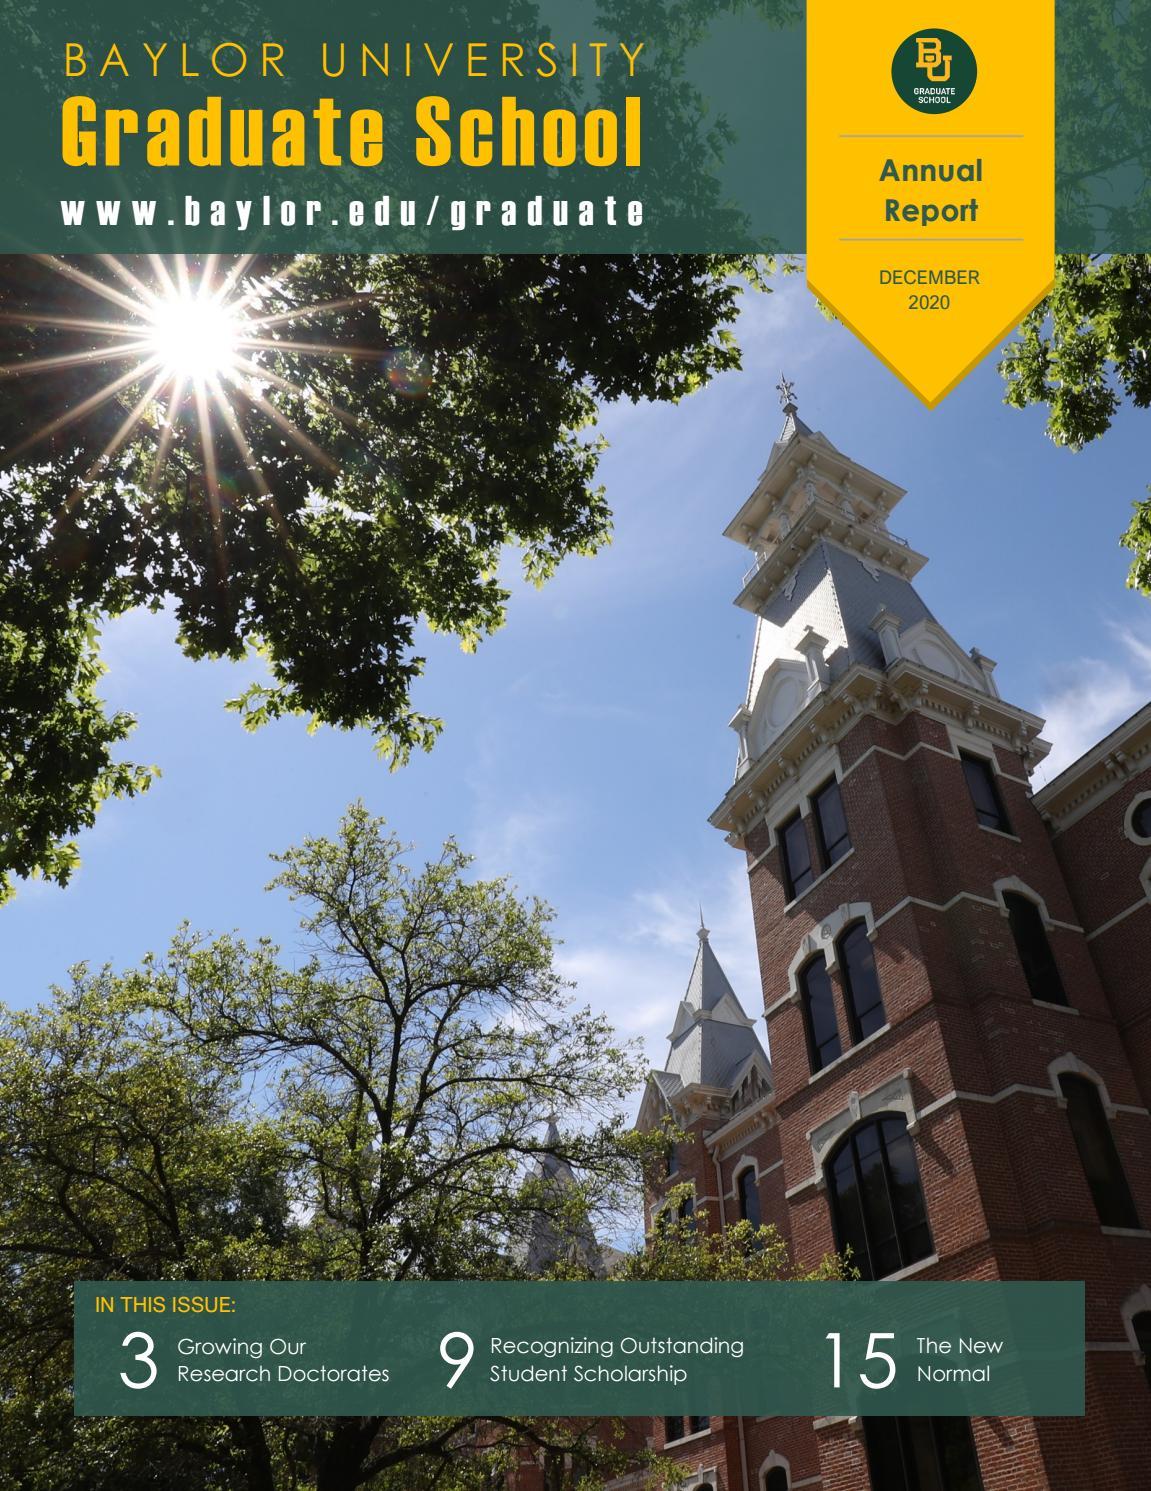 Baylor Spring 2022 Calendar.Baylor University Graduate School Annual Report 2020 By Baylor Graduate School Issuu